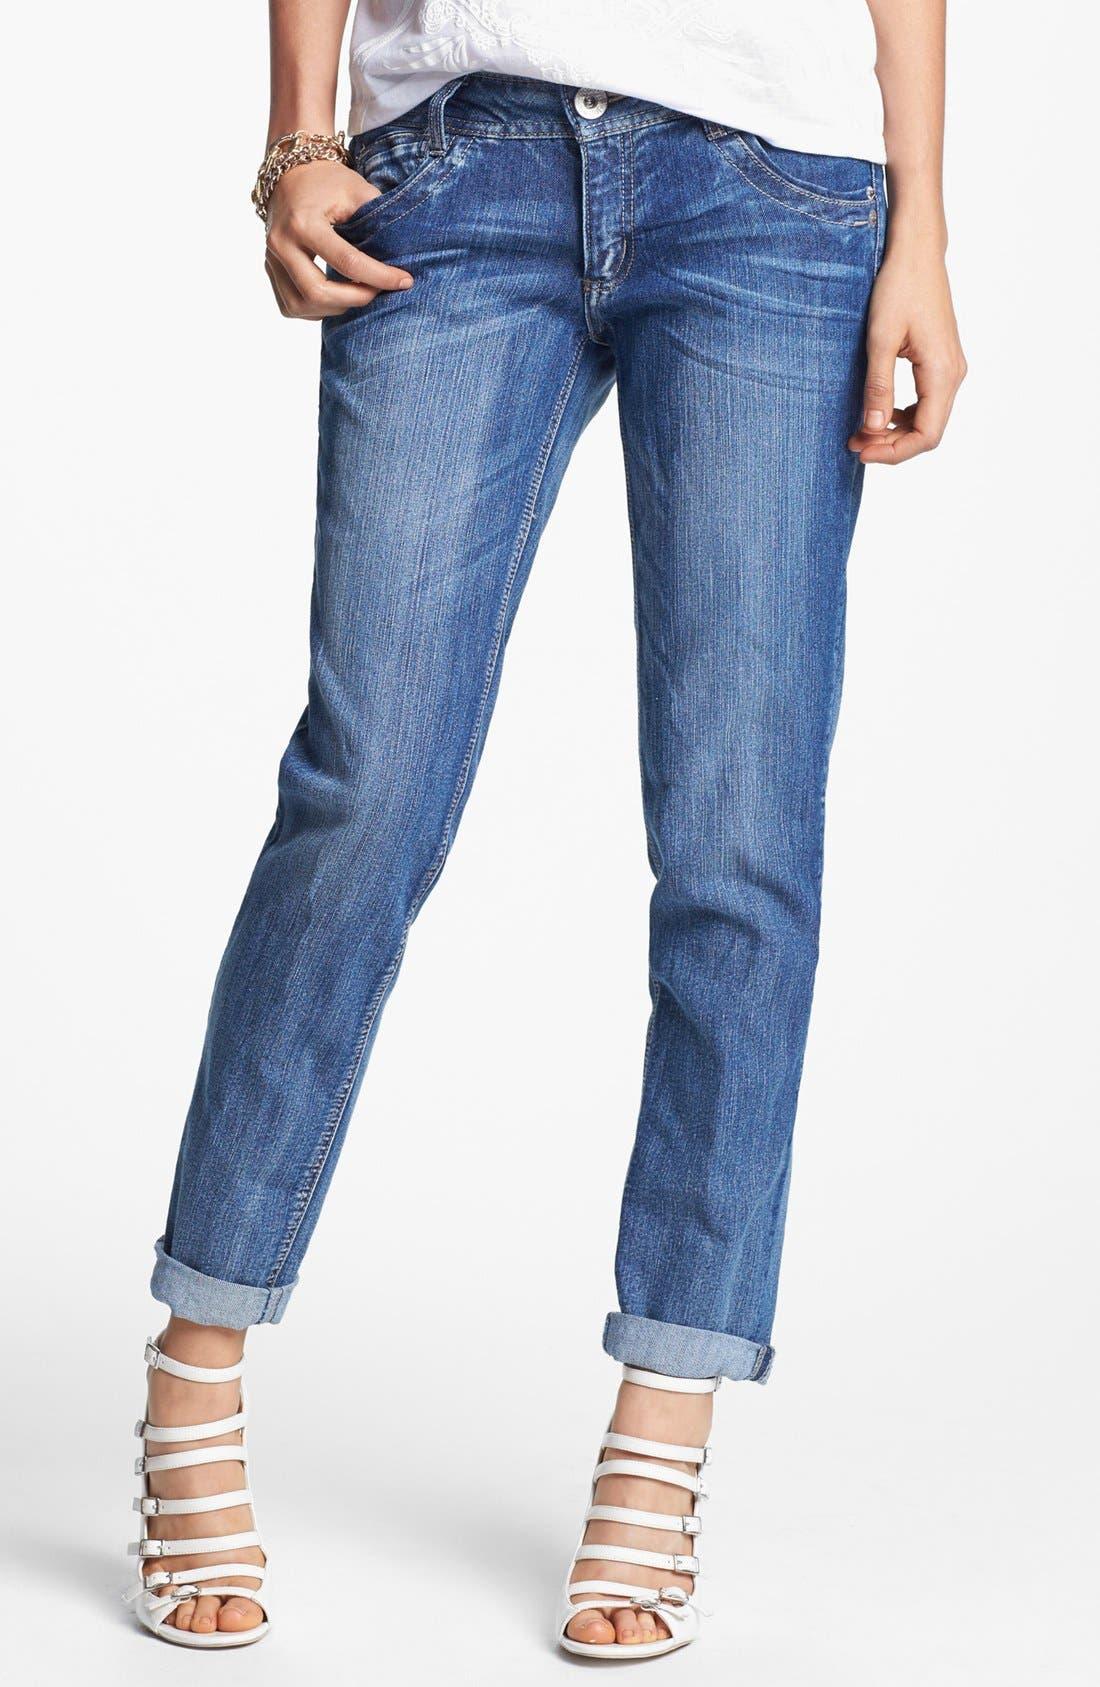 Alternate Image 1 Selected - Jolt 'Blasted' Boyfriend Jeans (Medium) (Juniors)